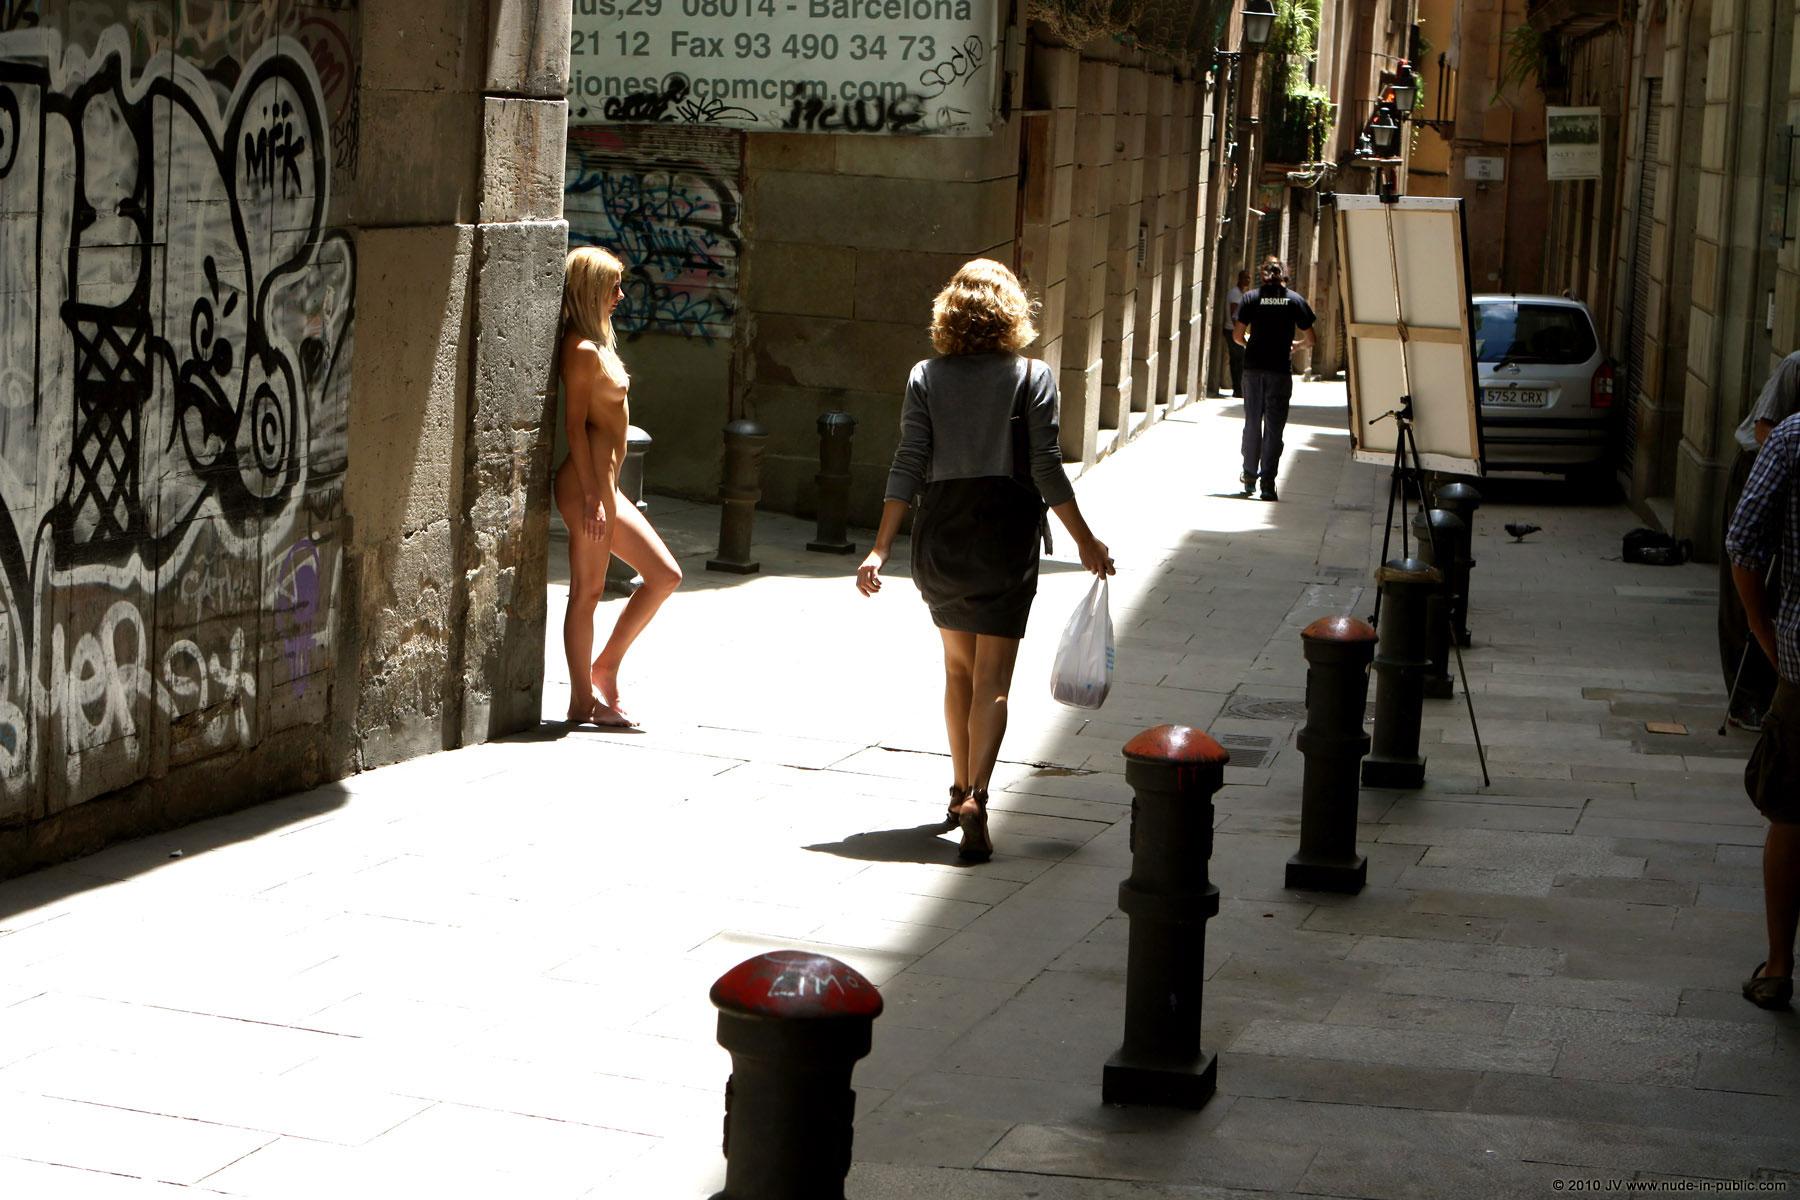 judita-street-painter-barcelona-nude-public-08